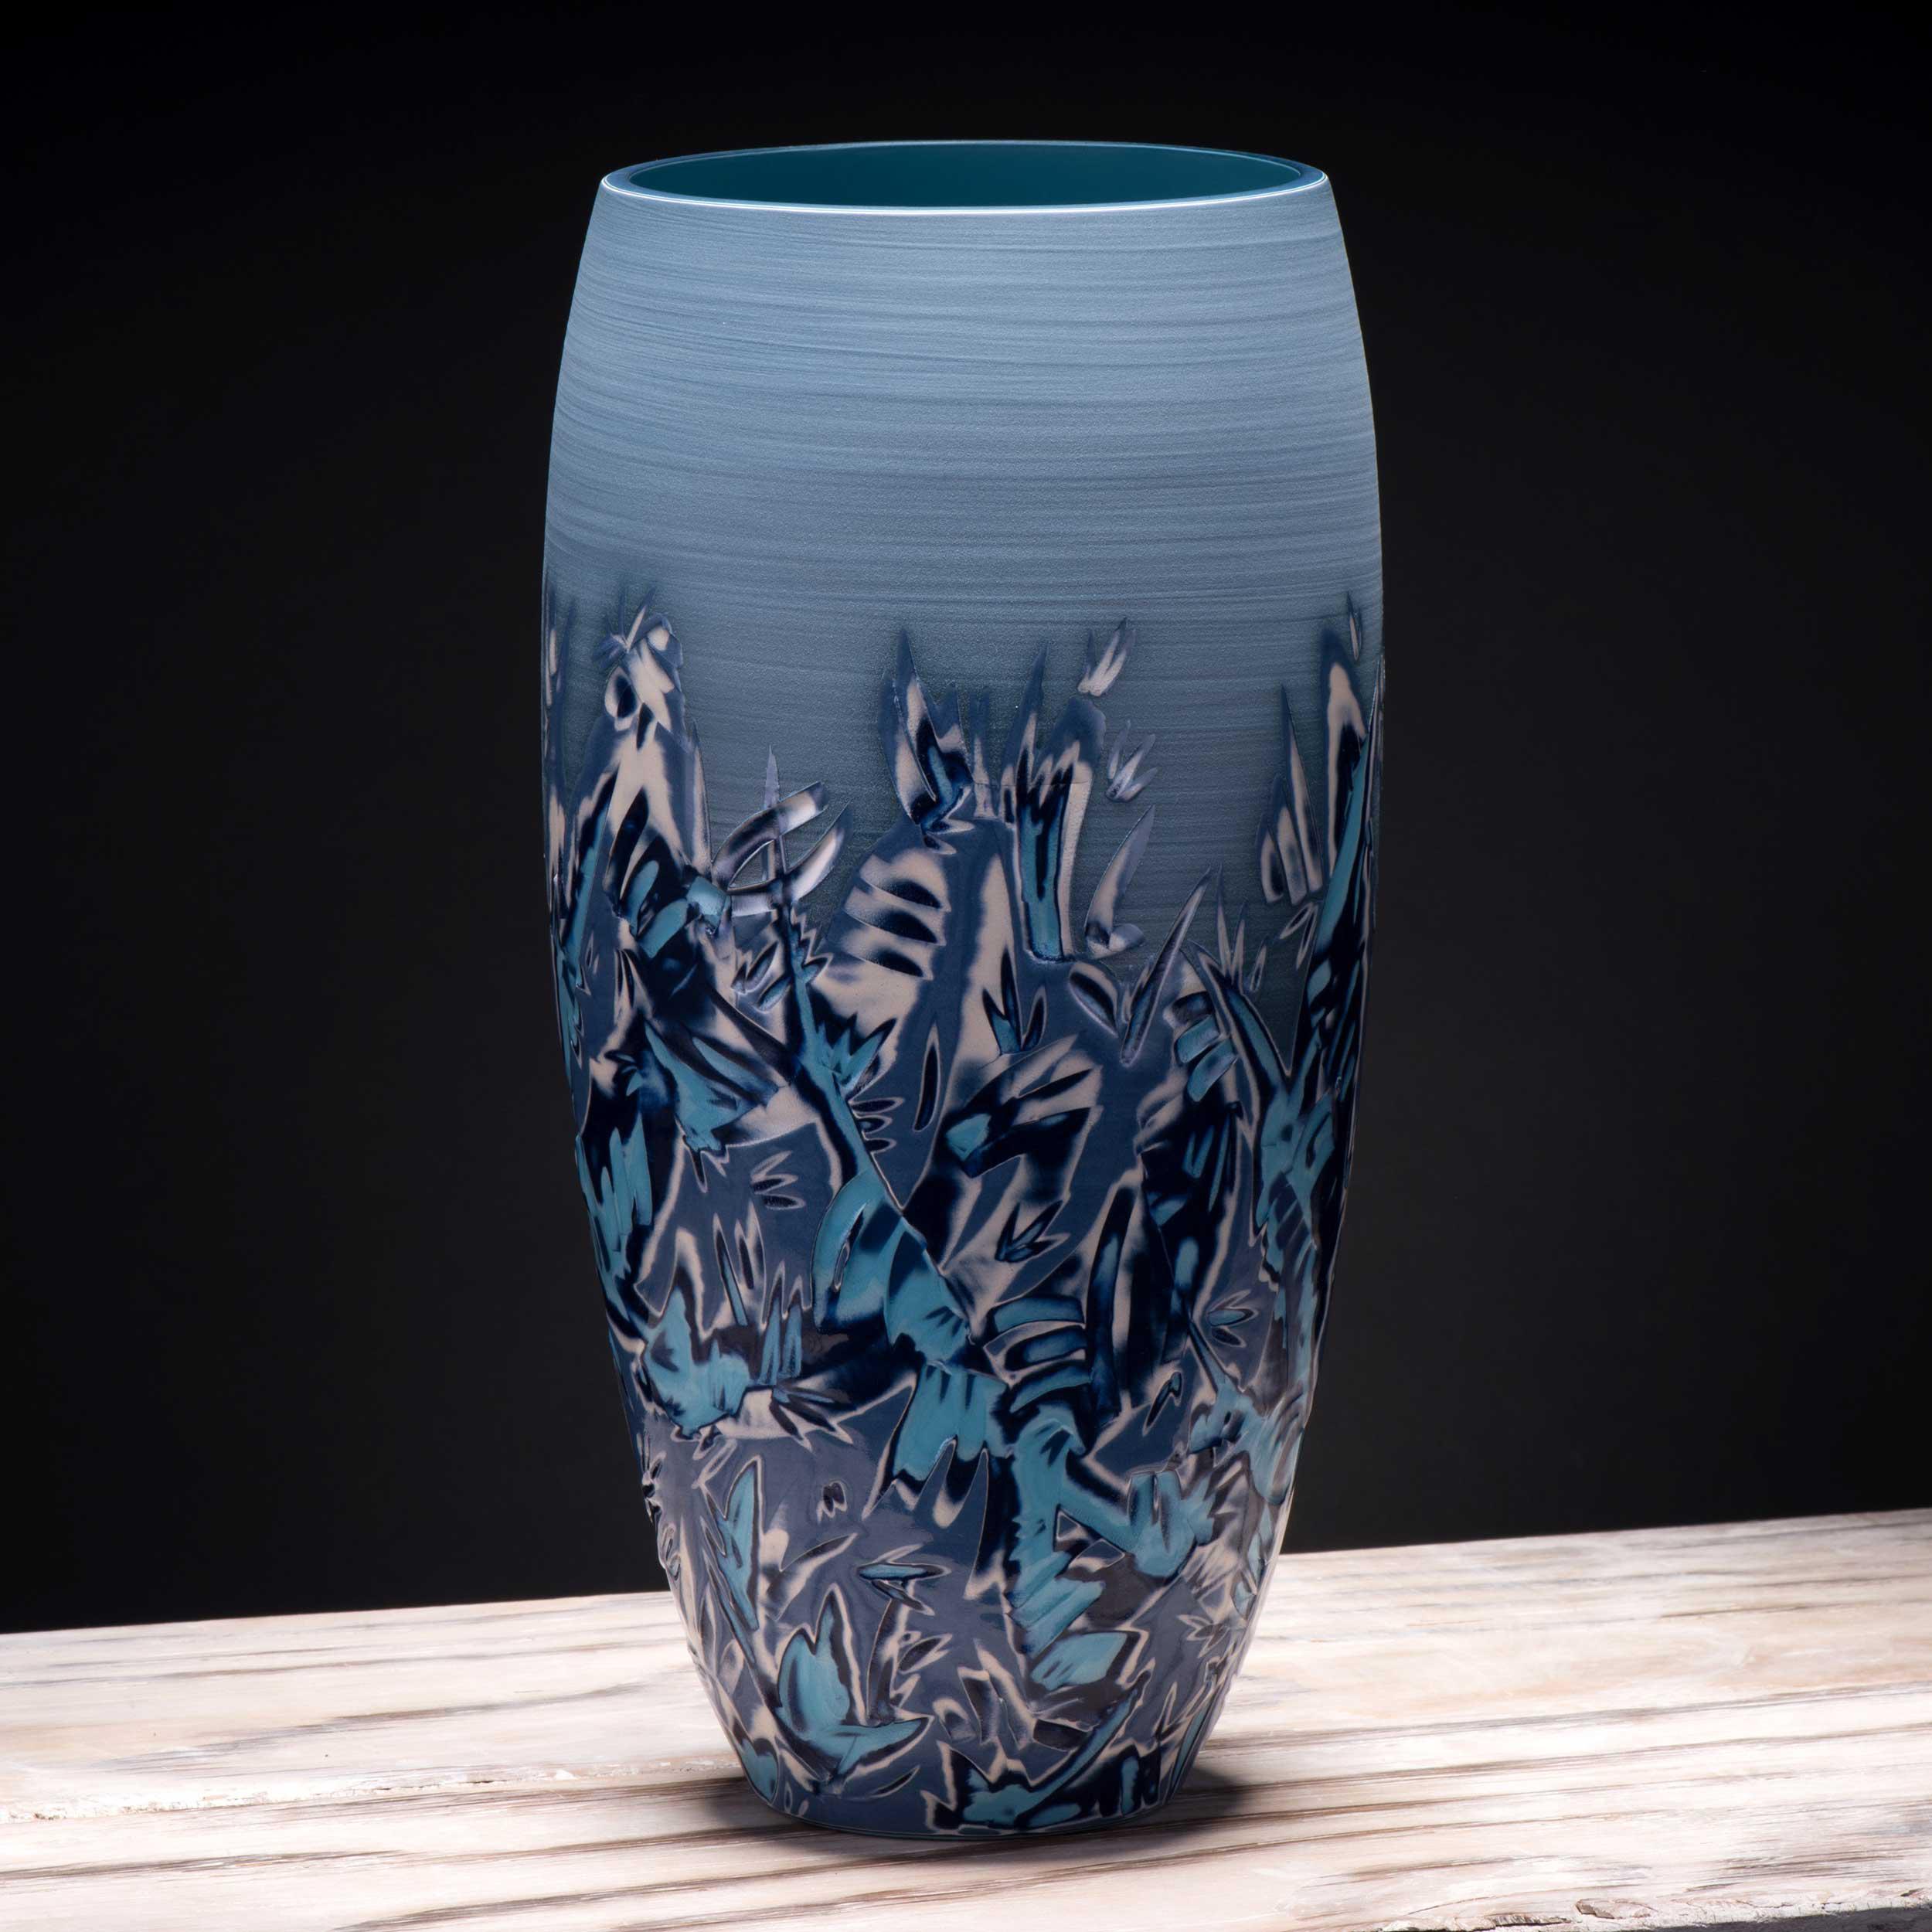 Copy of Turquoise Blue Wave Ceramic Vase Seascape Ceramics by Rowena Gil